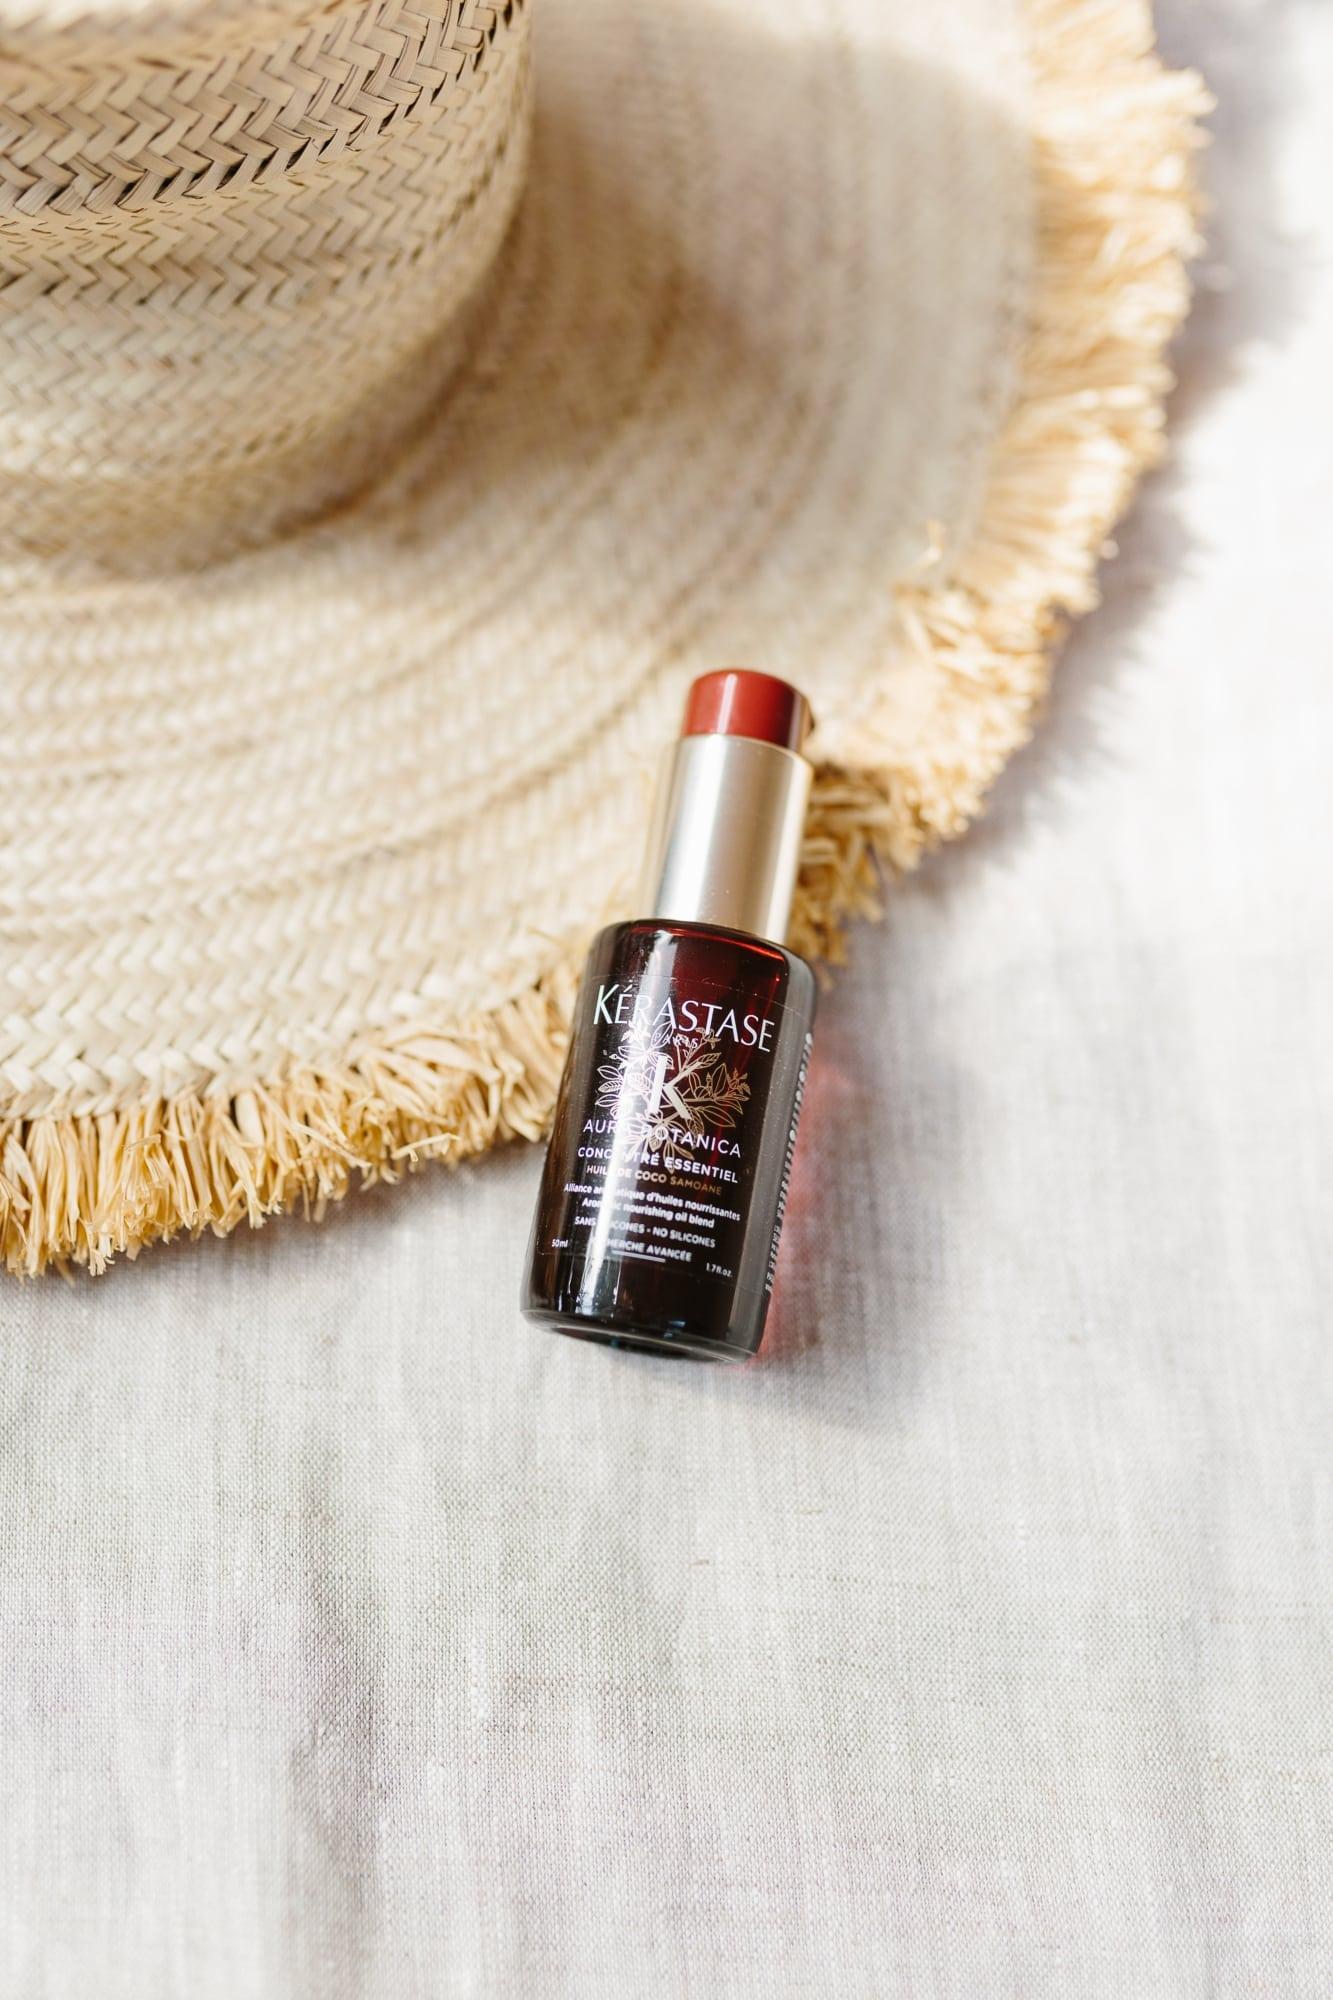 Kerastase Aura Botanica Hair Oil